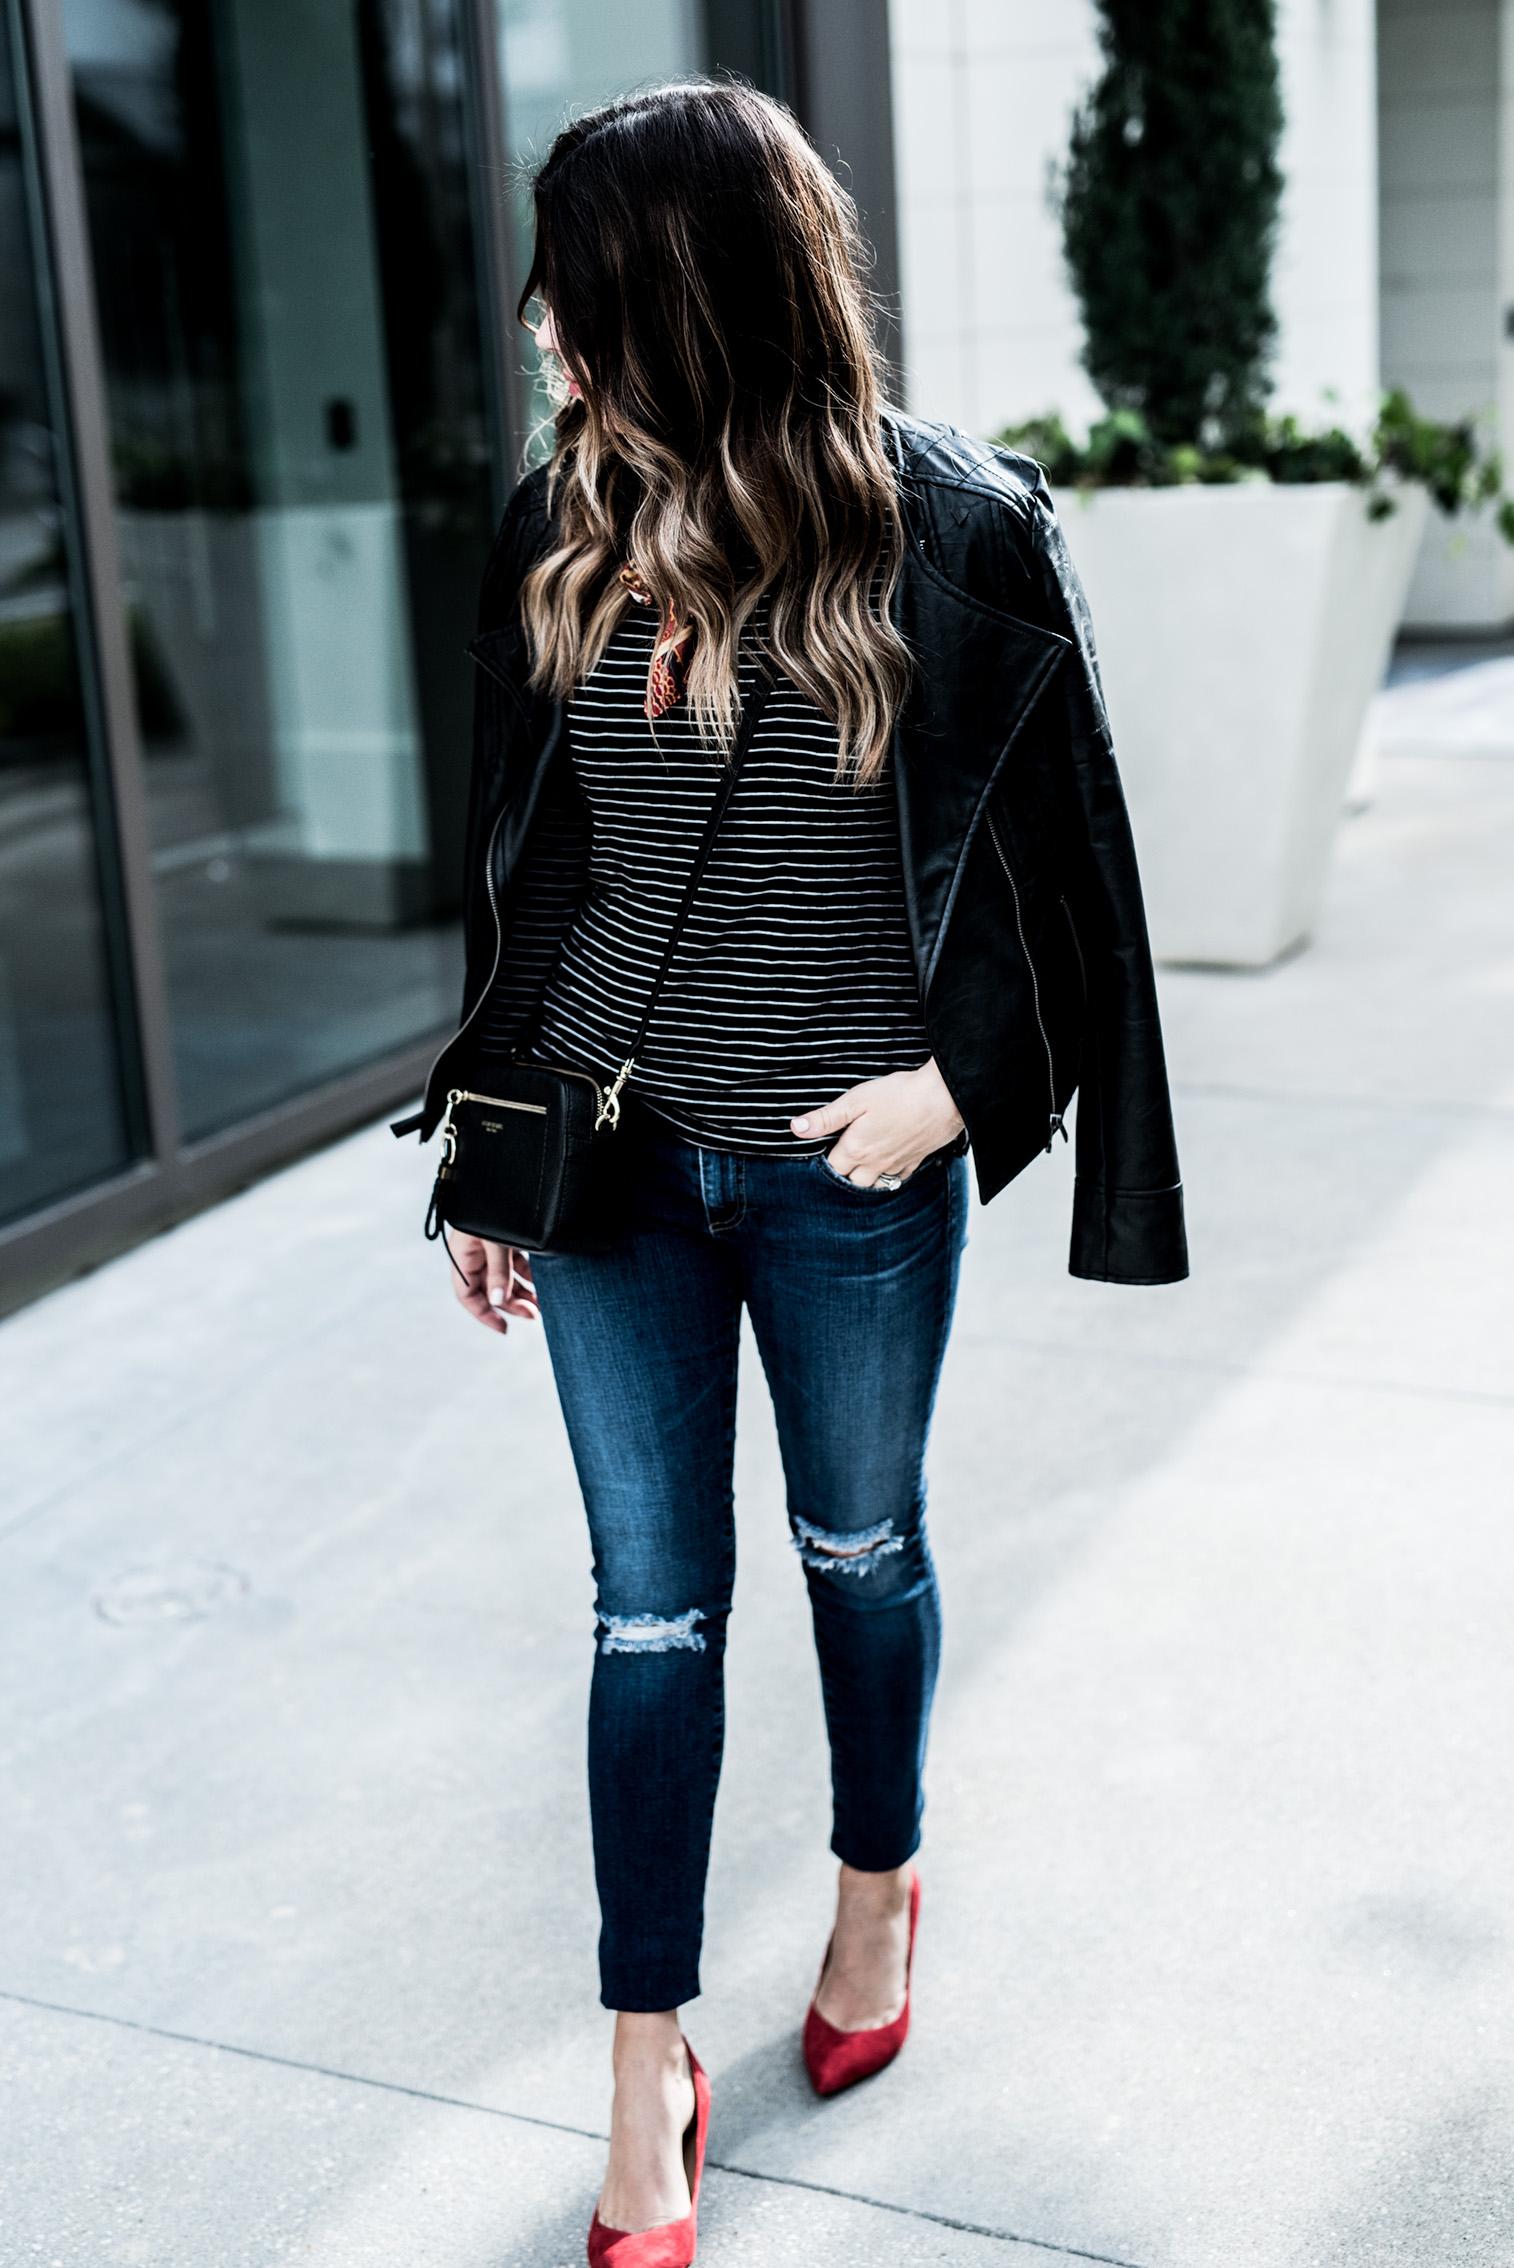 Houston fashion and lifestyle blogger Tiffany Jais |